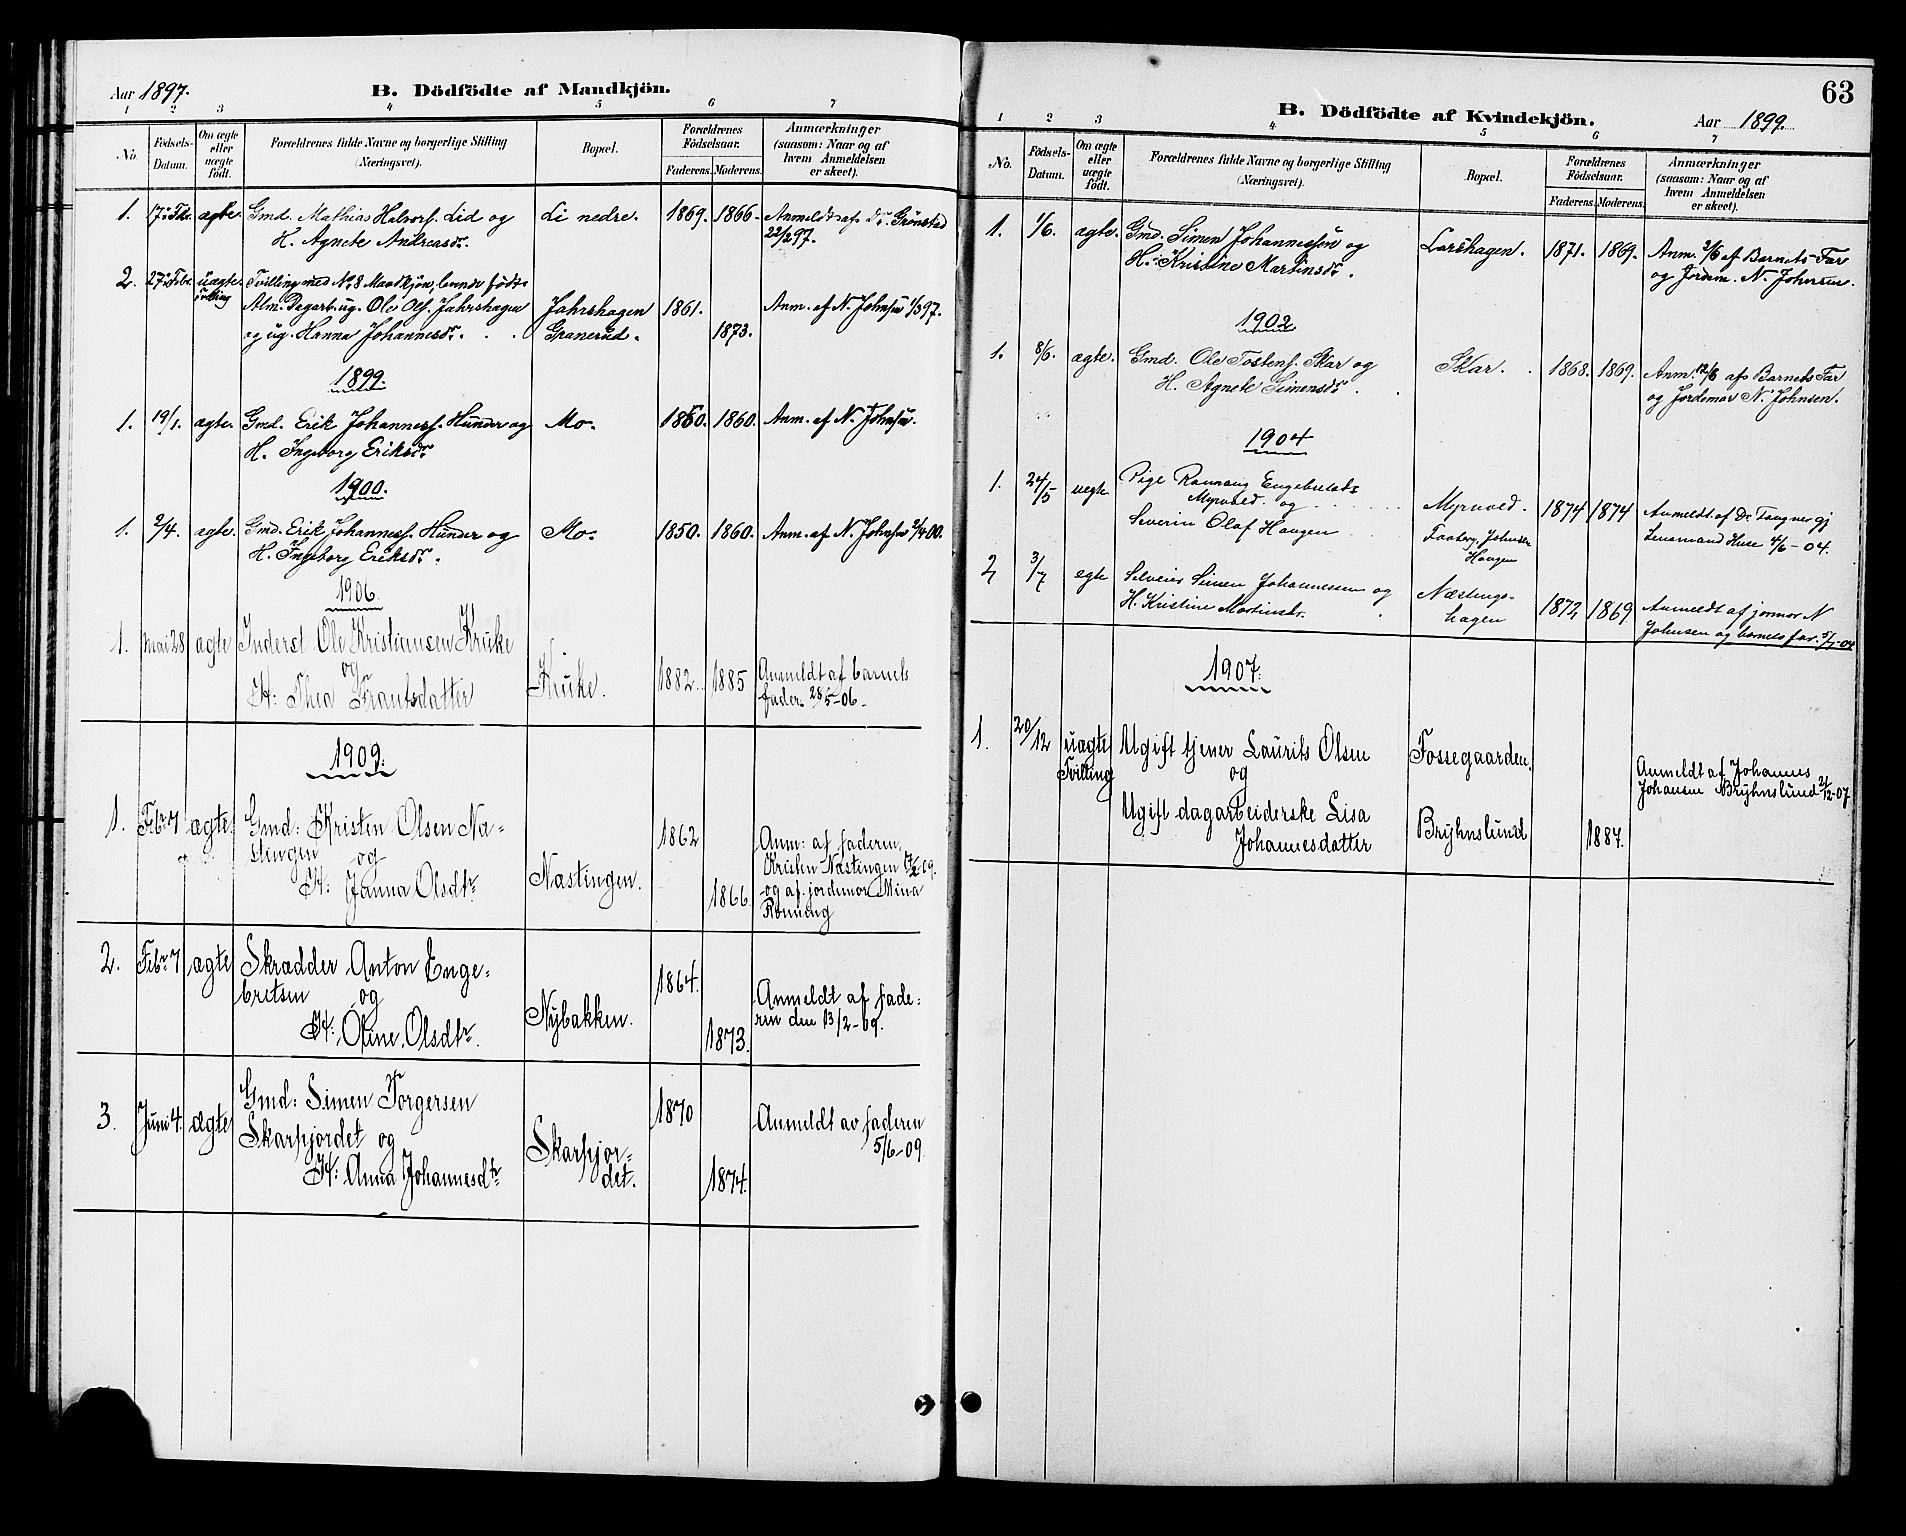 SAH, Øyer prestekontor, Klokkerbok nr. 5, 1897-1913, s. 63